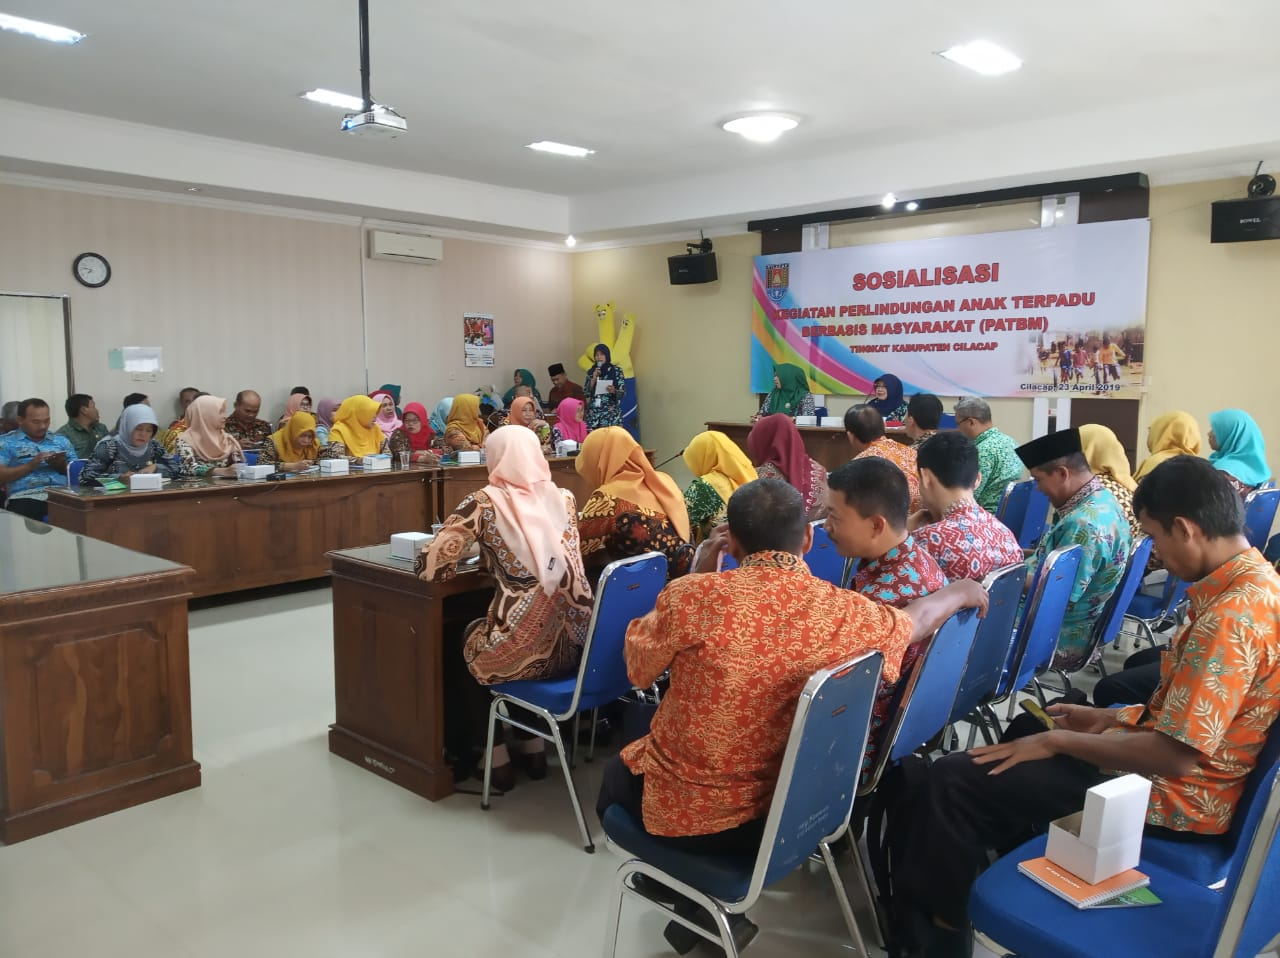 SOSIALISASI PERLINDUNGAN ANAK BERBASIS MASYARAKAT (PATBM)